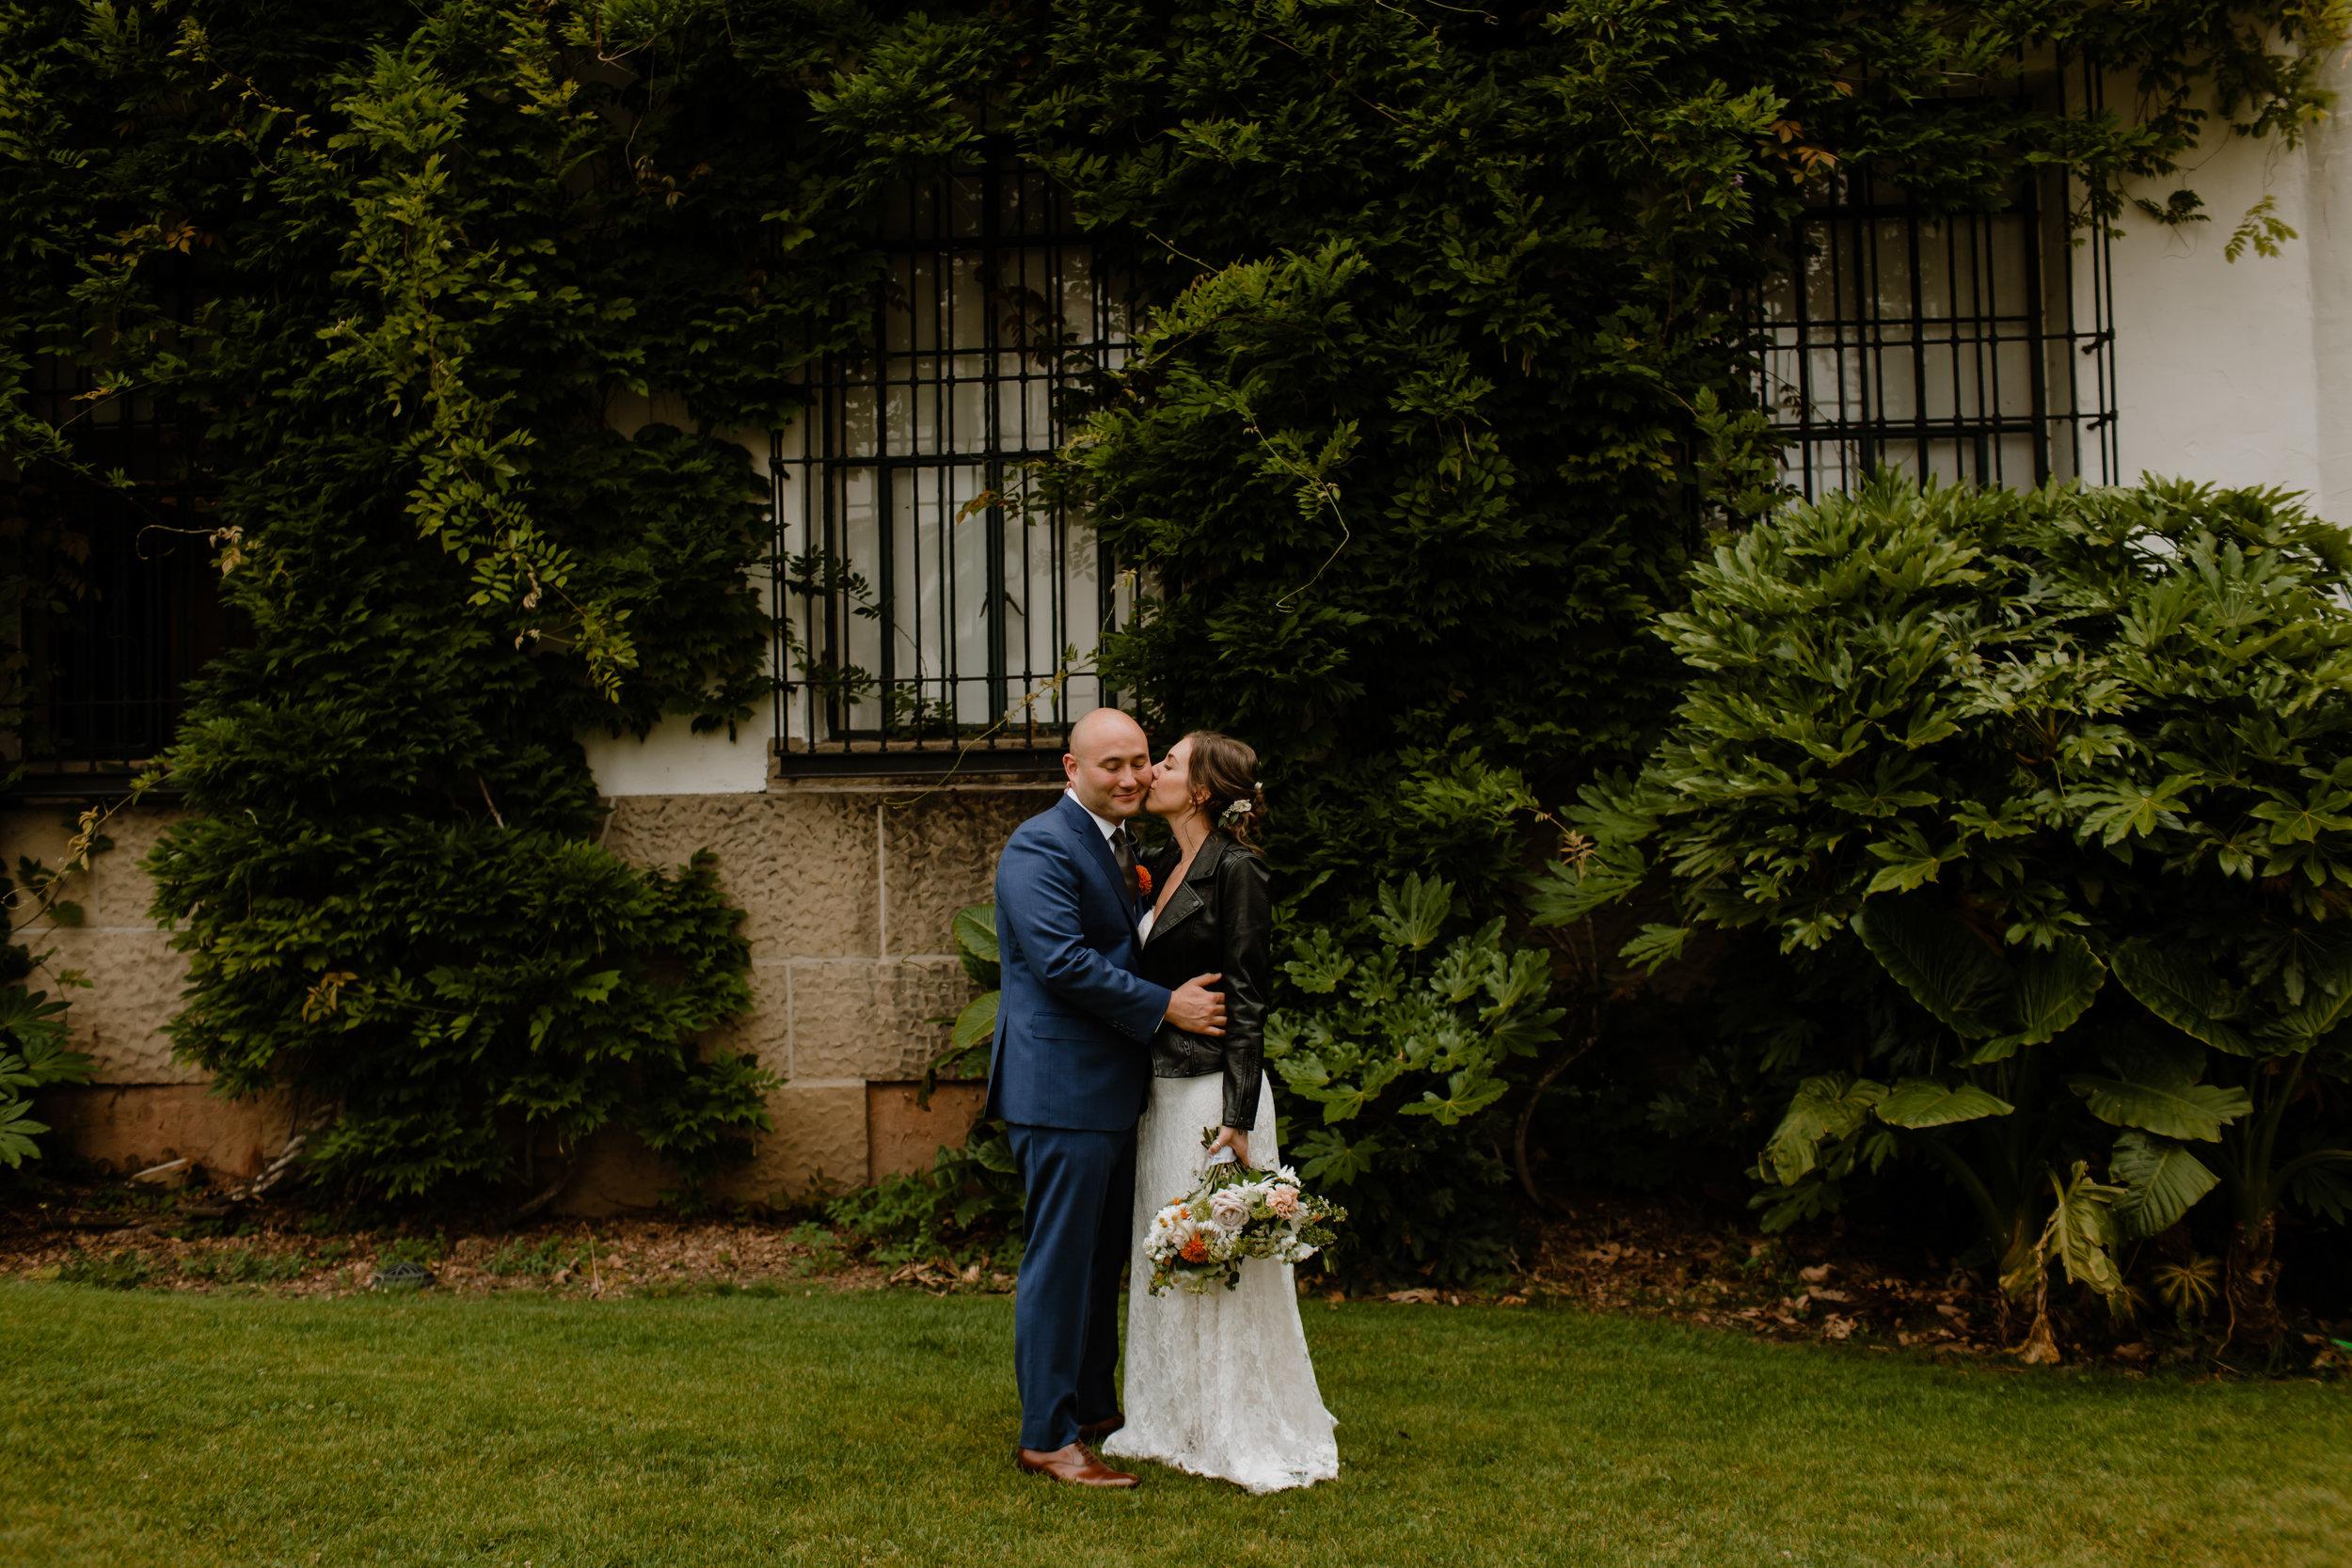 Robin and John Santa Barbara Wedding - Eve Rox Photography-133.jpg